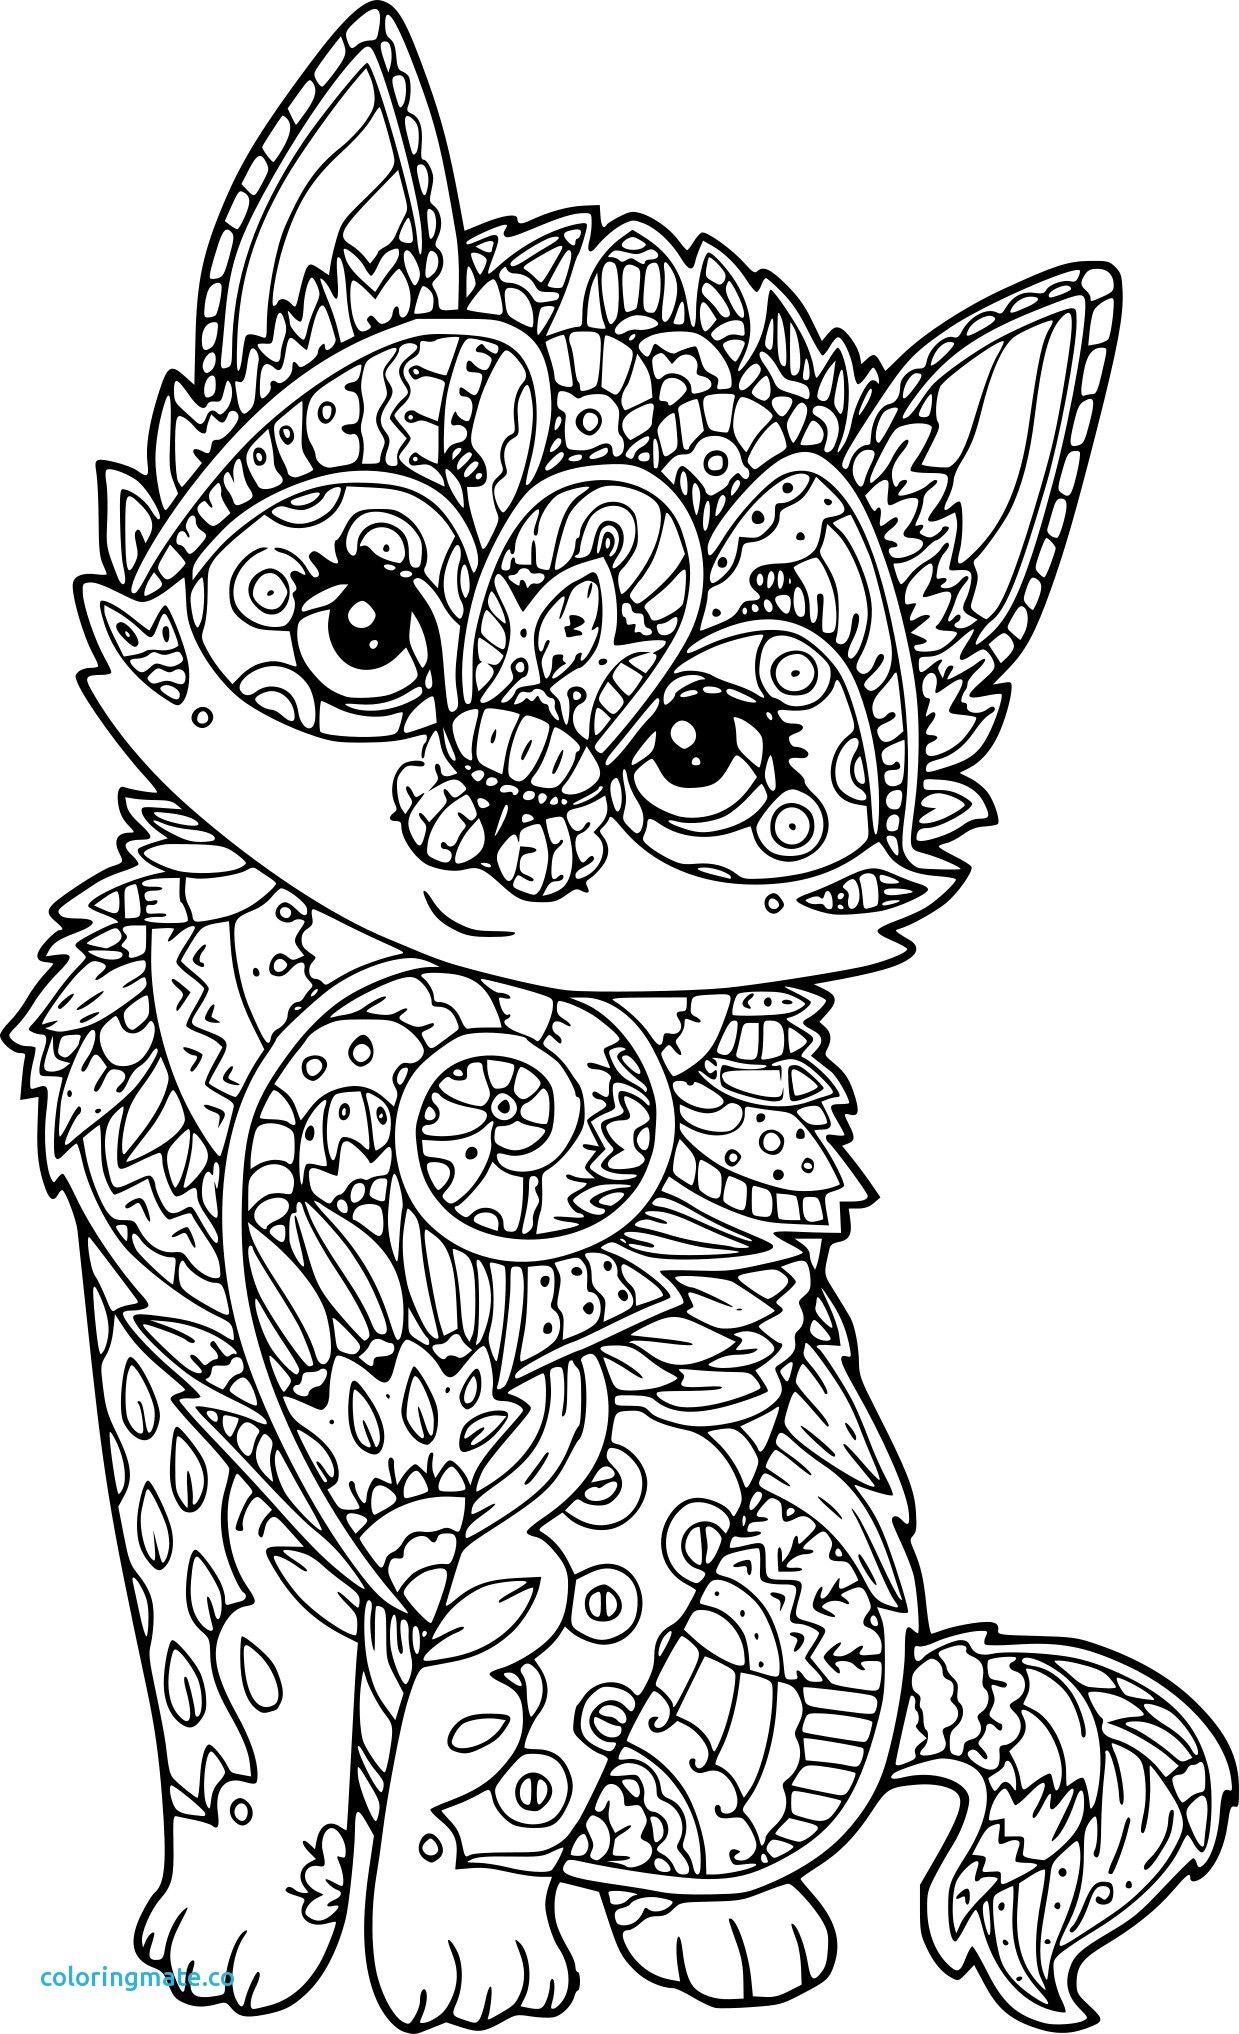 Coloriage Mandala Chat Papillon Fresh Coloriage Chat avec Coloriage Anti Stress